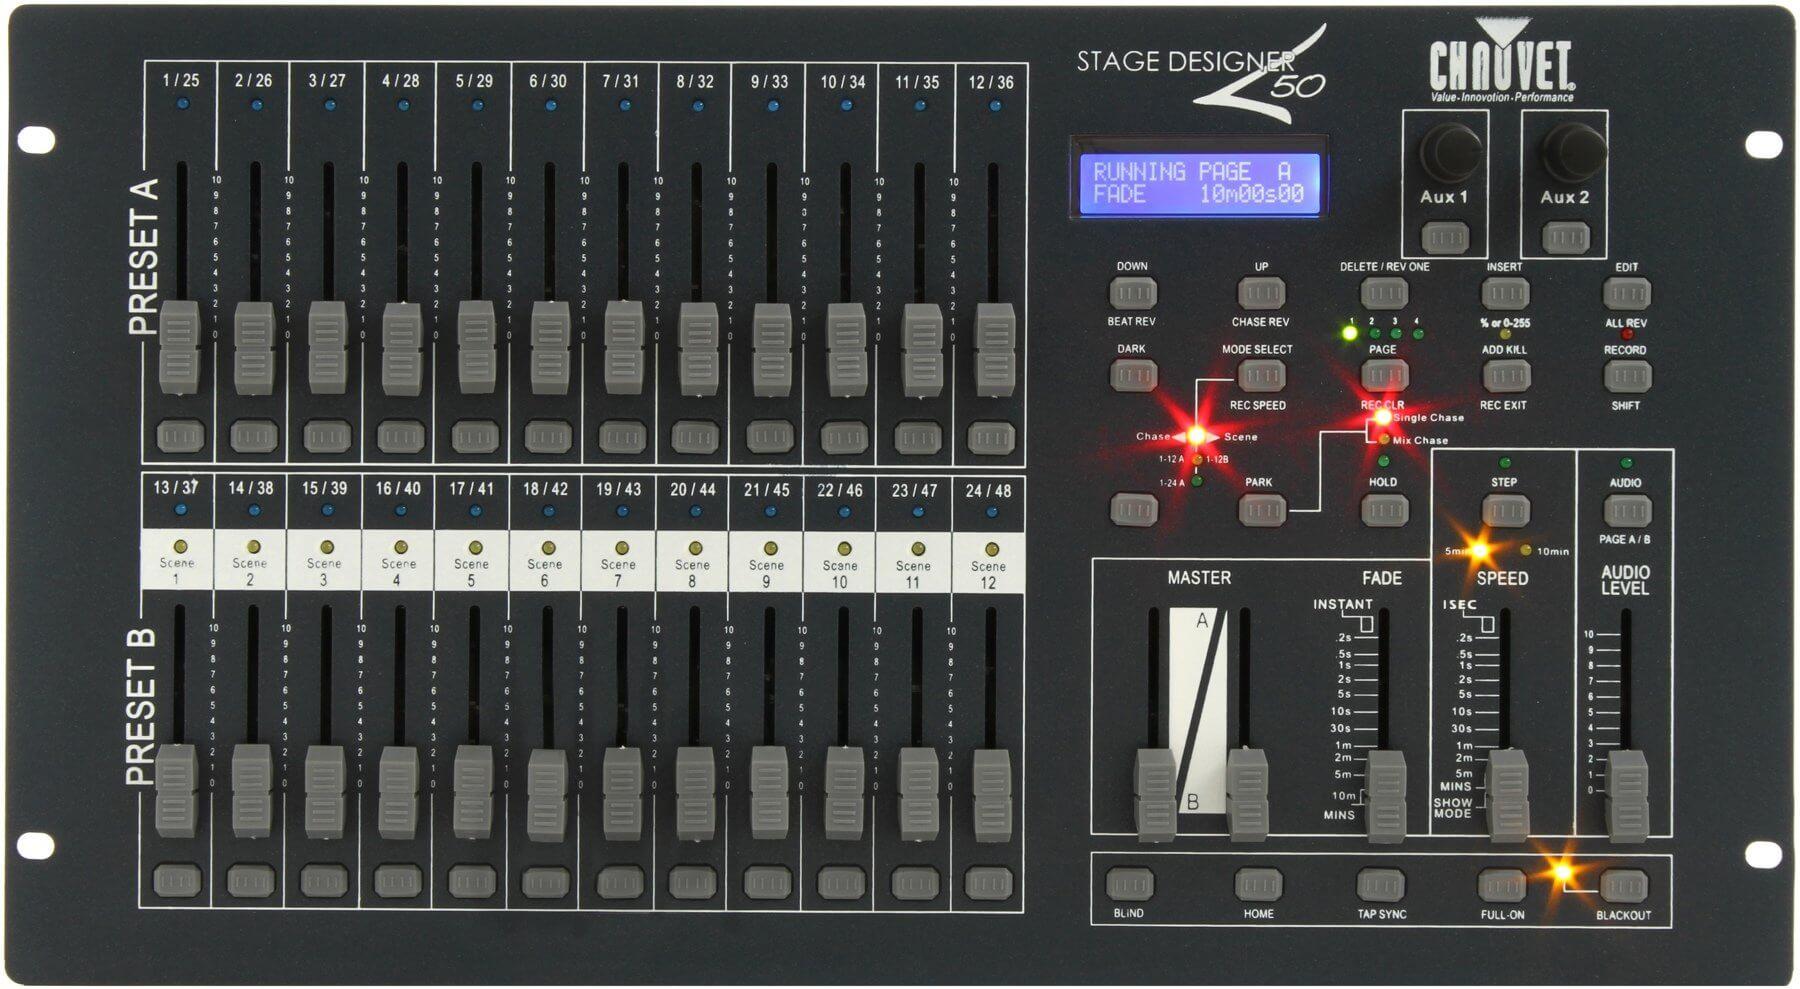 Chauvet Stage Designer 50 DMX Control Desk